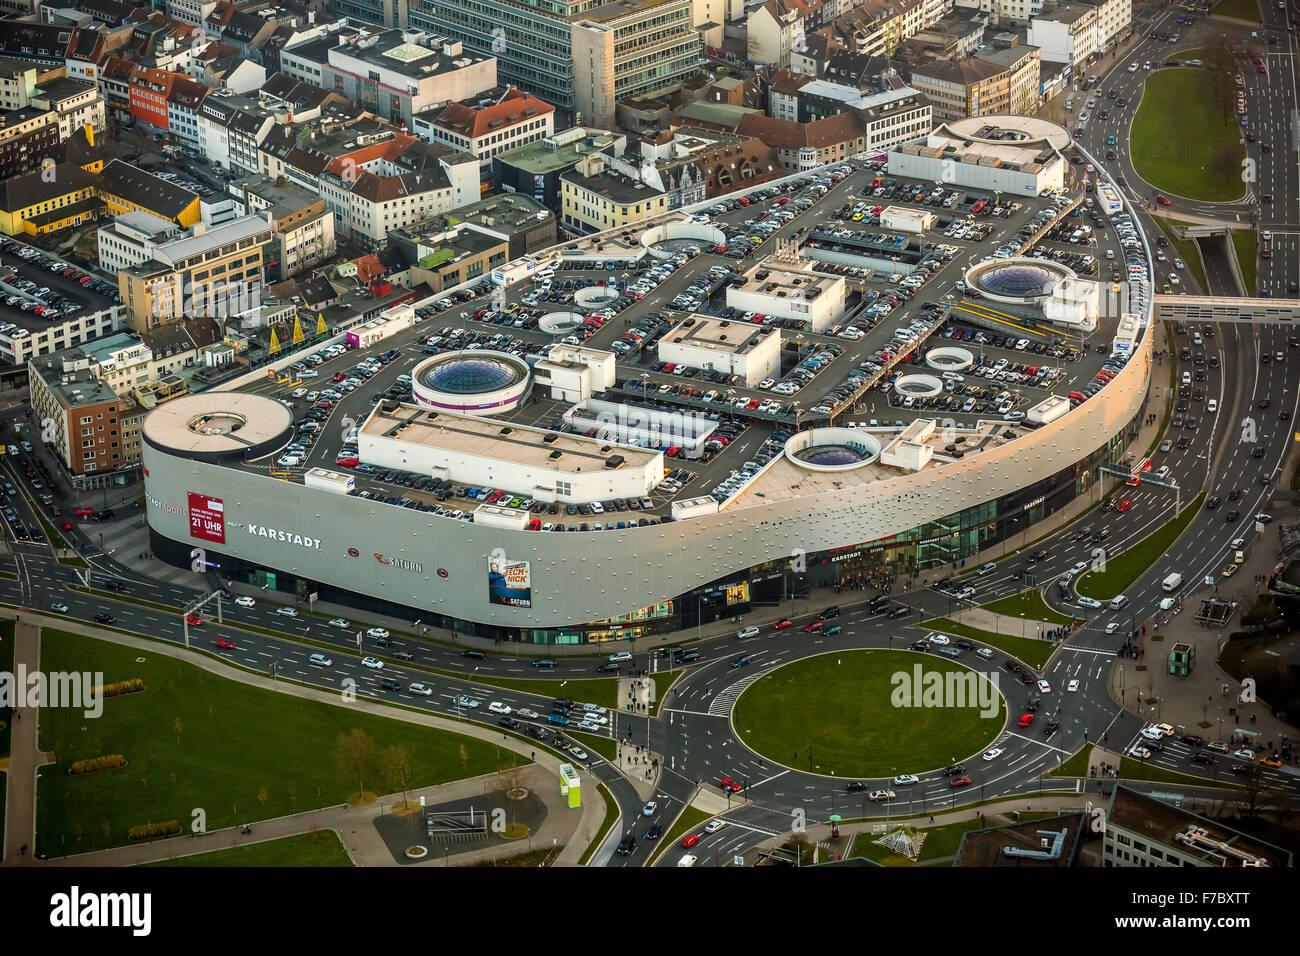 Limbecker Platz Shopping Centre, Essen, Ruhr area, North Rhine-Westphalia, Germany, Europe, Aerial view, birds-eyes - Stock Image